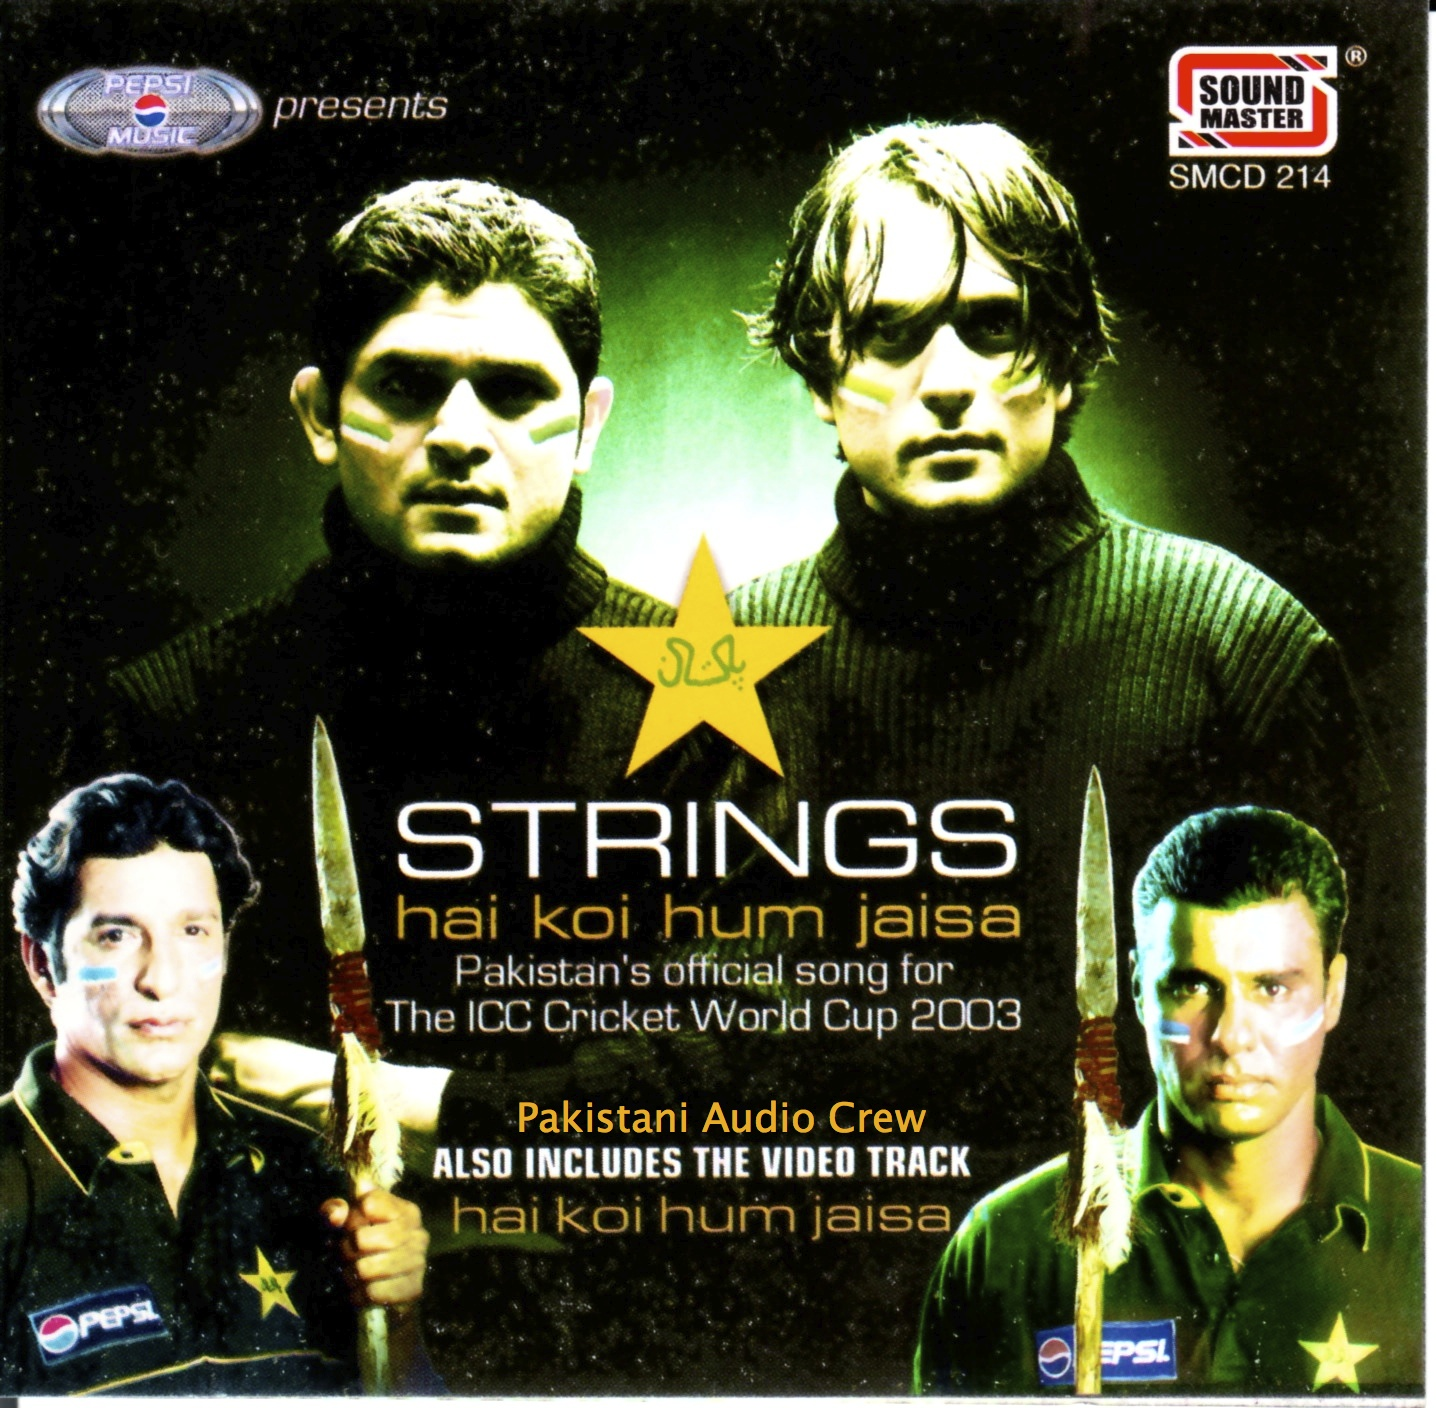 Koi Puche Mere Dil Se Mp3 Song: Muzikeye: Strings [1990 To 2008-MP3-VBR-320Kbps]